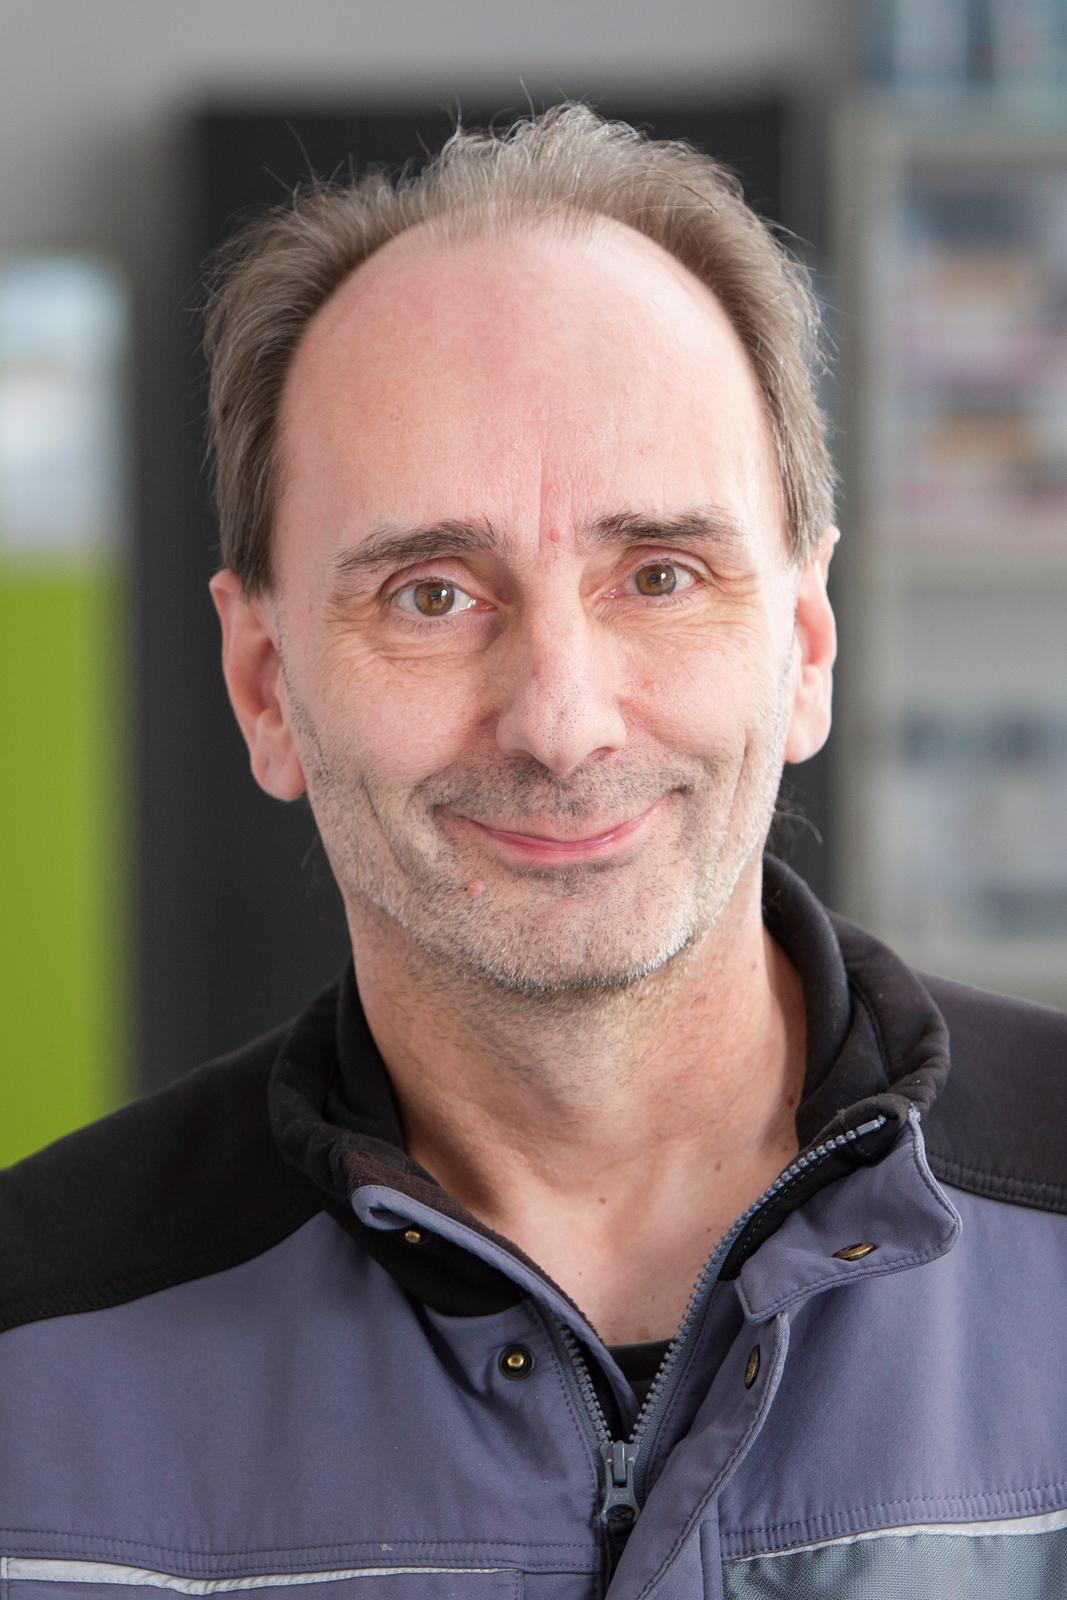 Peter Bremm